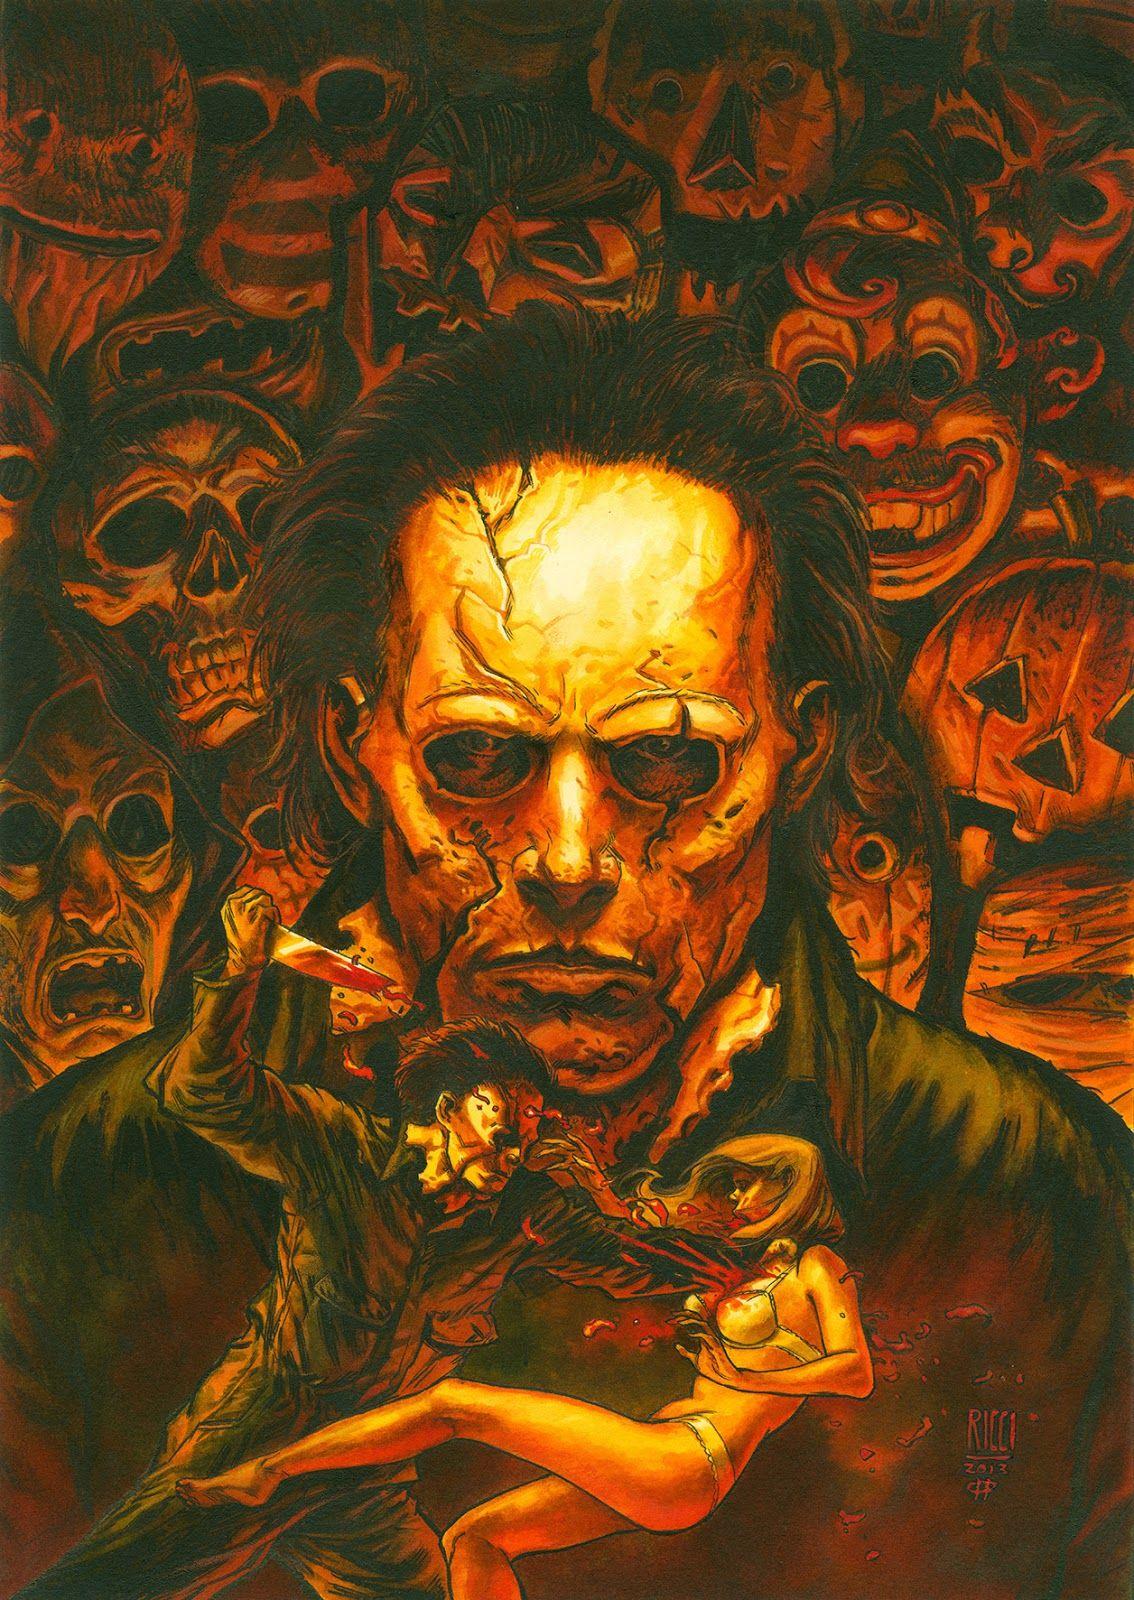 Rob Zombie Art - Bing images | Zombie <3 | Pinterest | Rob zombie ...